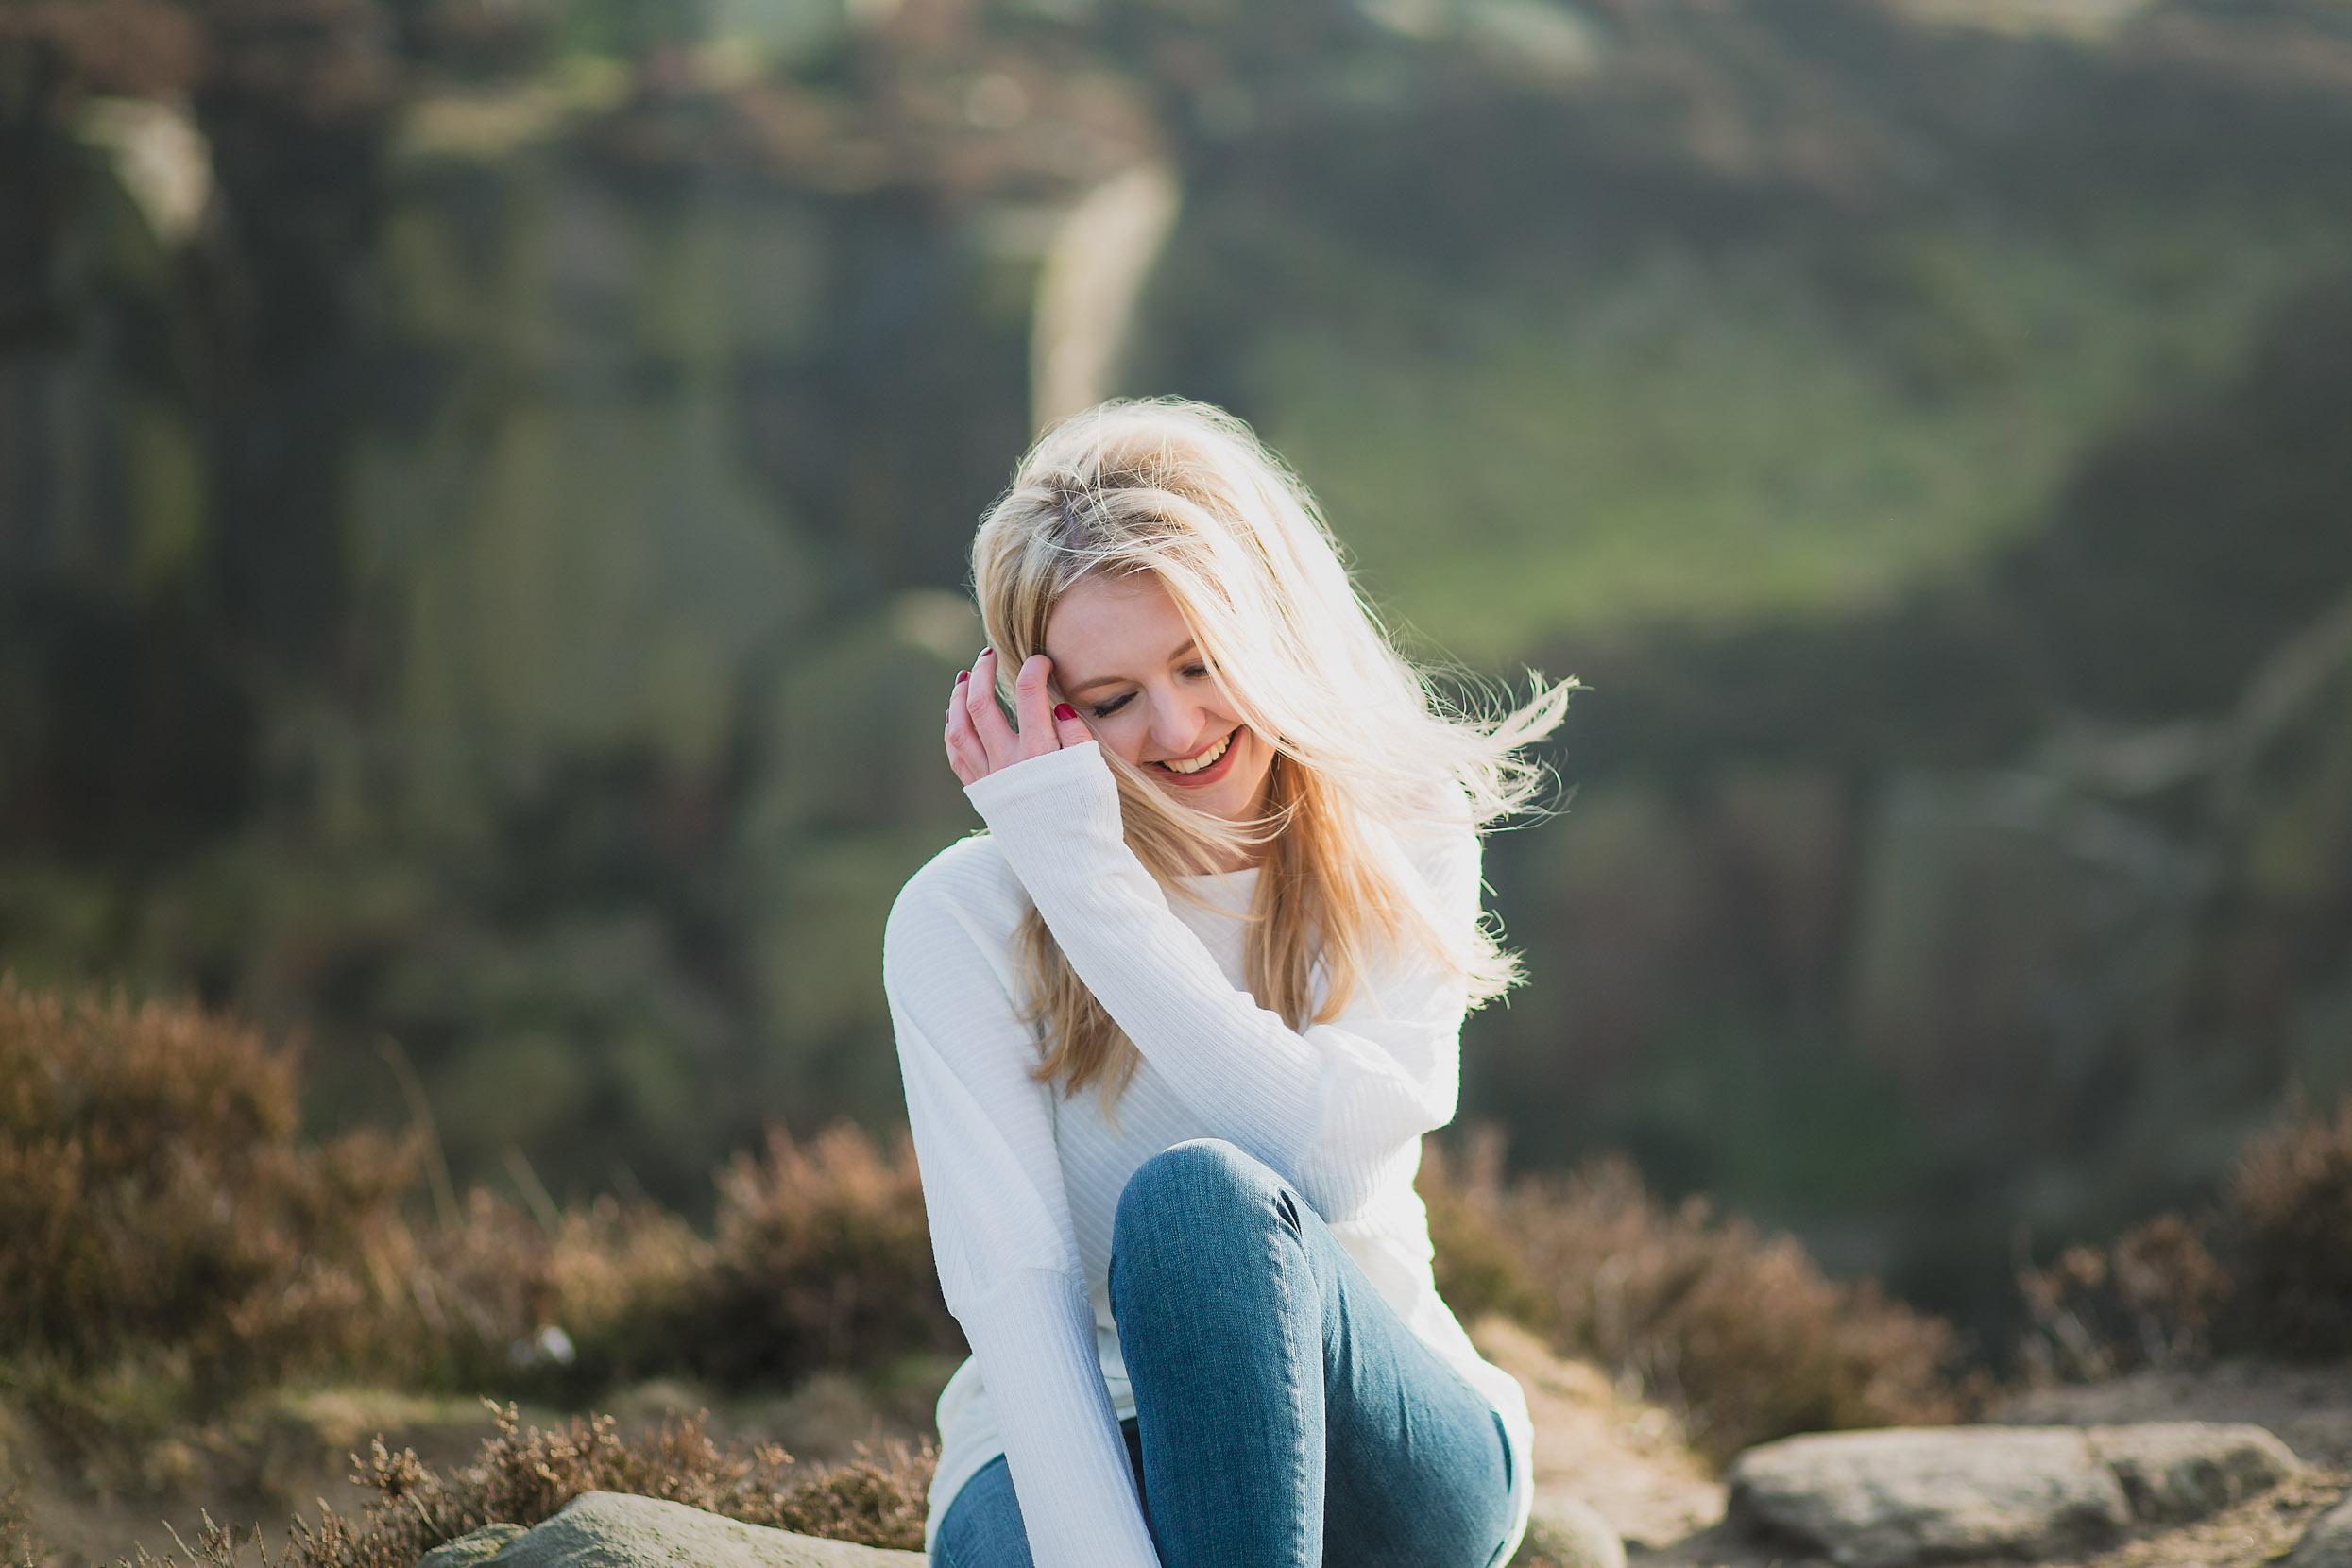 Jessica-Boswell-Marie-Francesca-Web-012.jpg